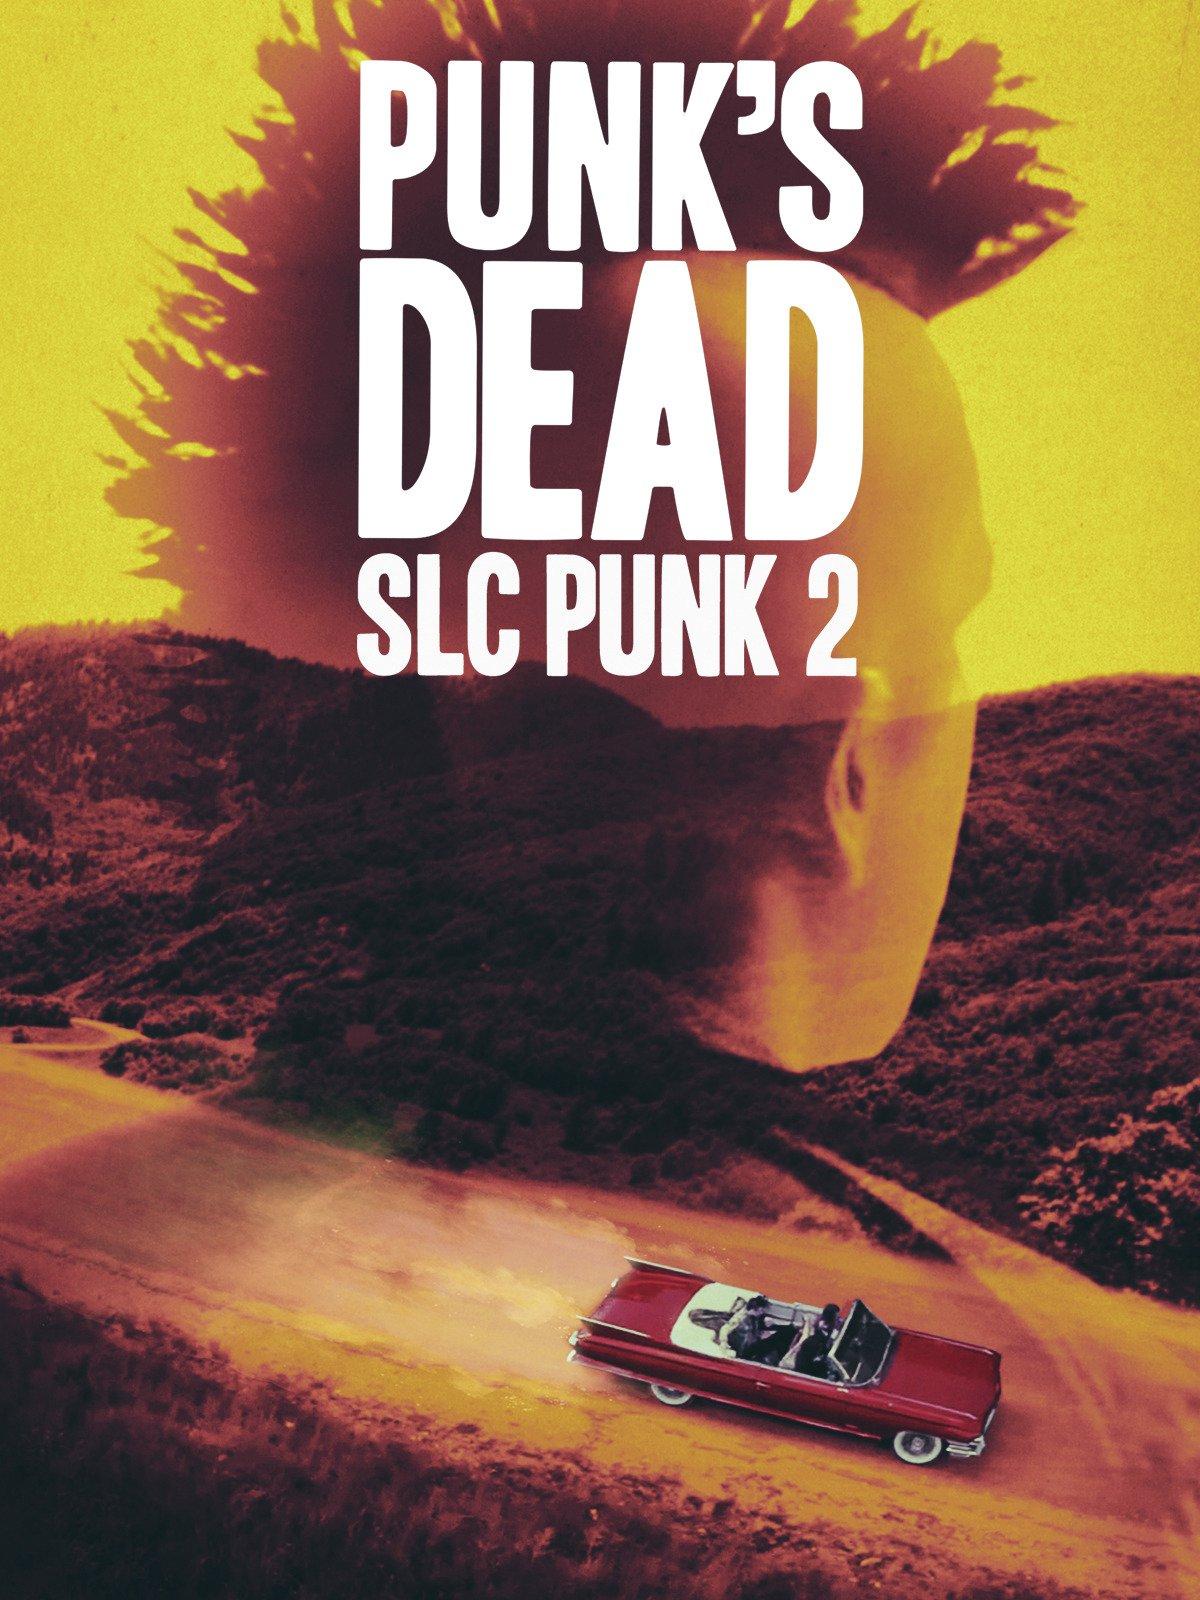 Punk's Dead: SLC Punk 2 on Amazon Prime Video UK